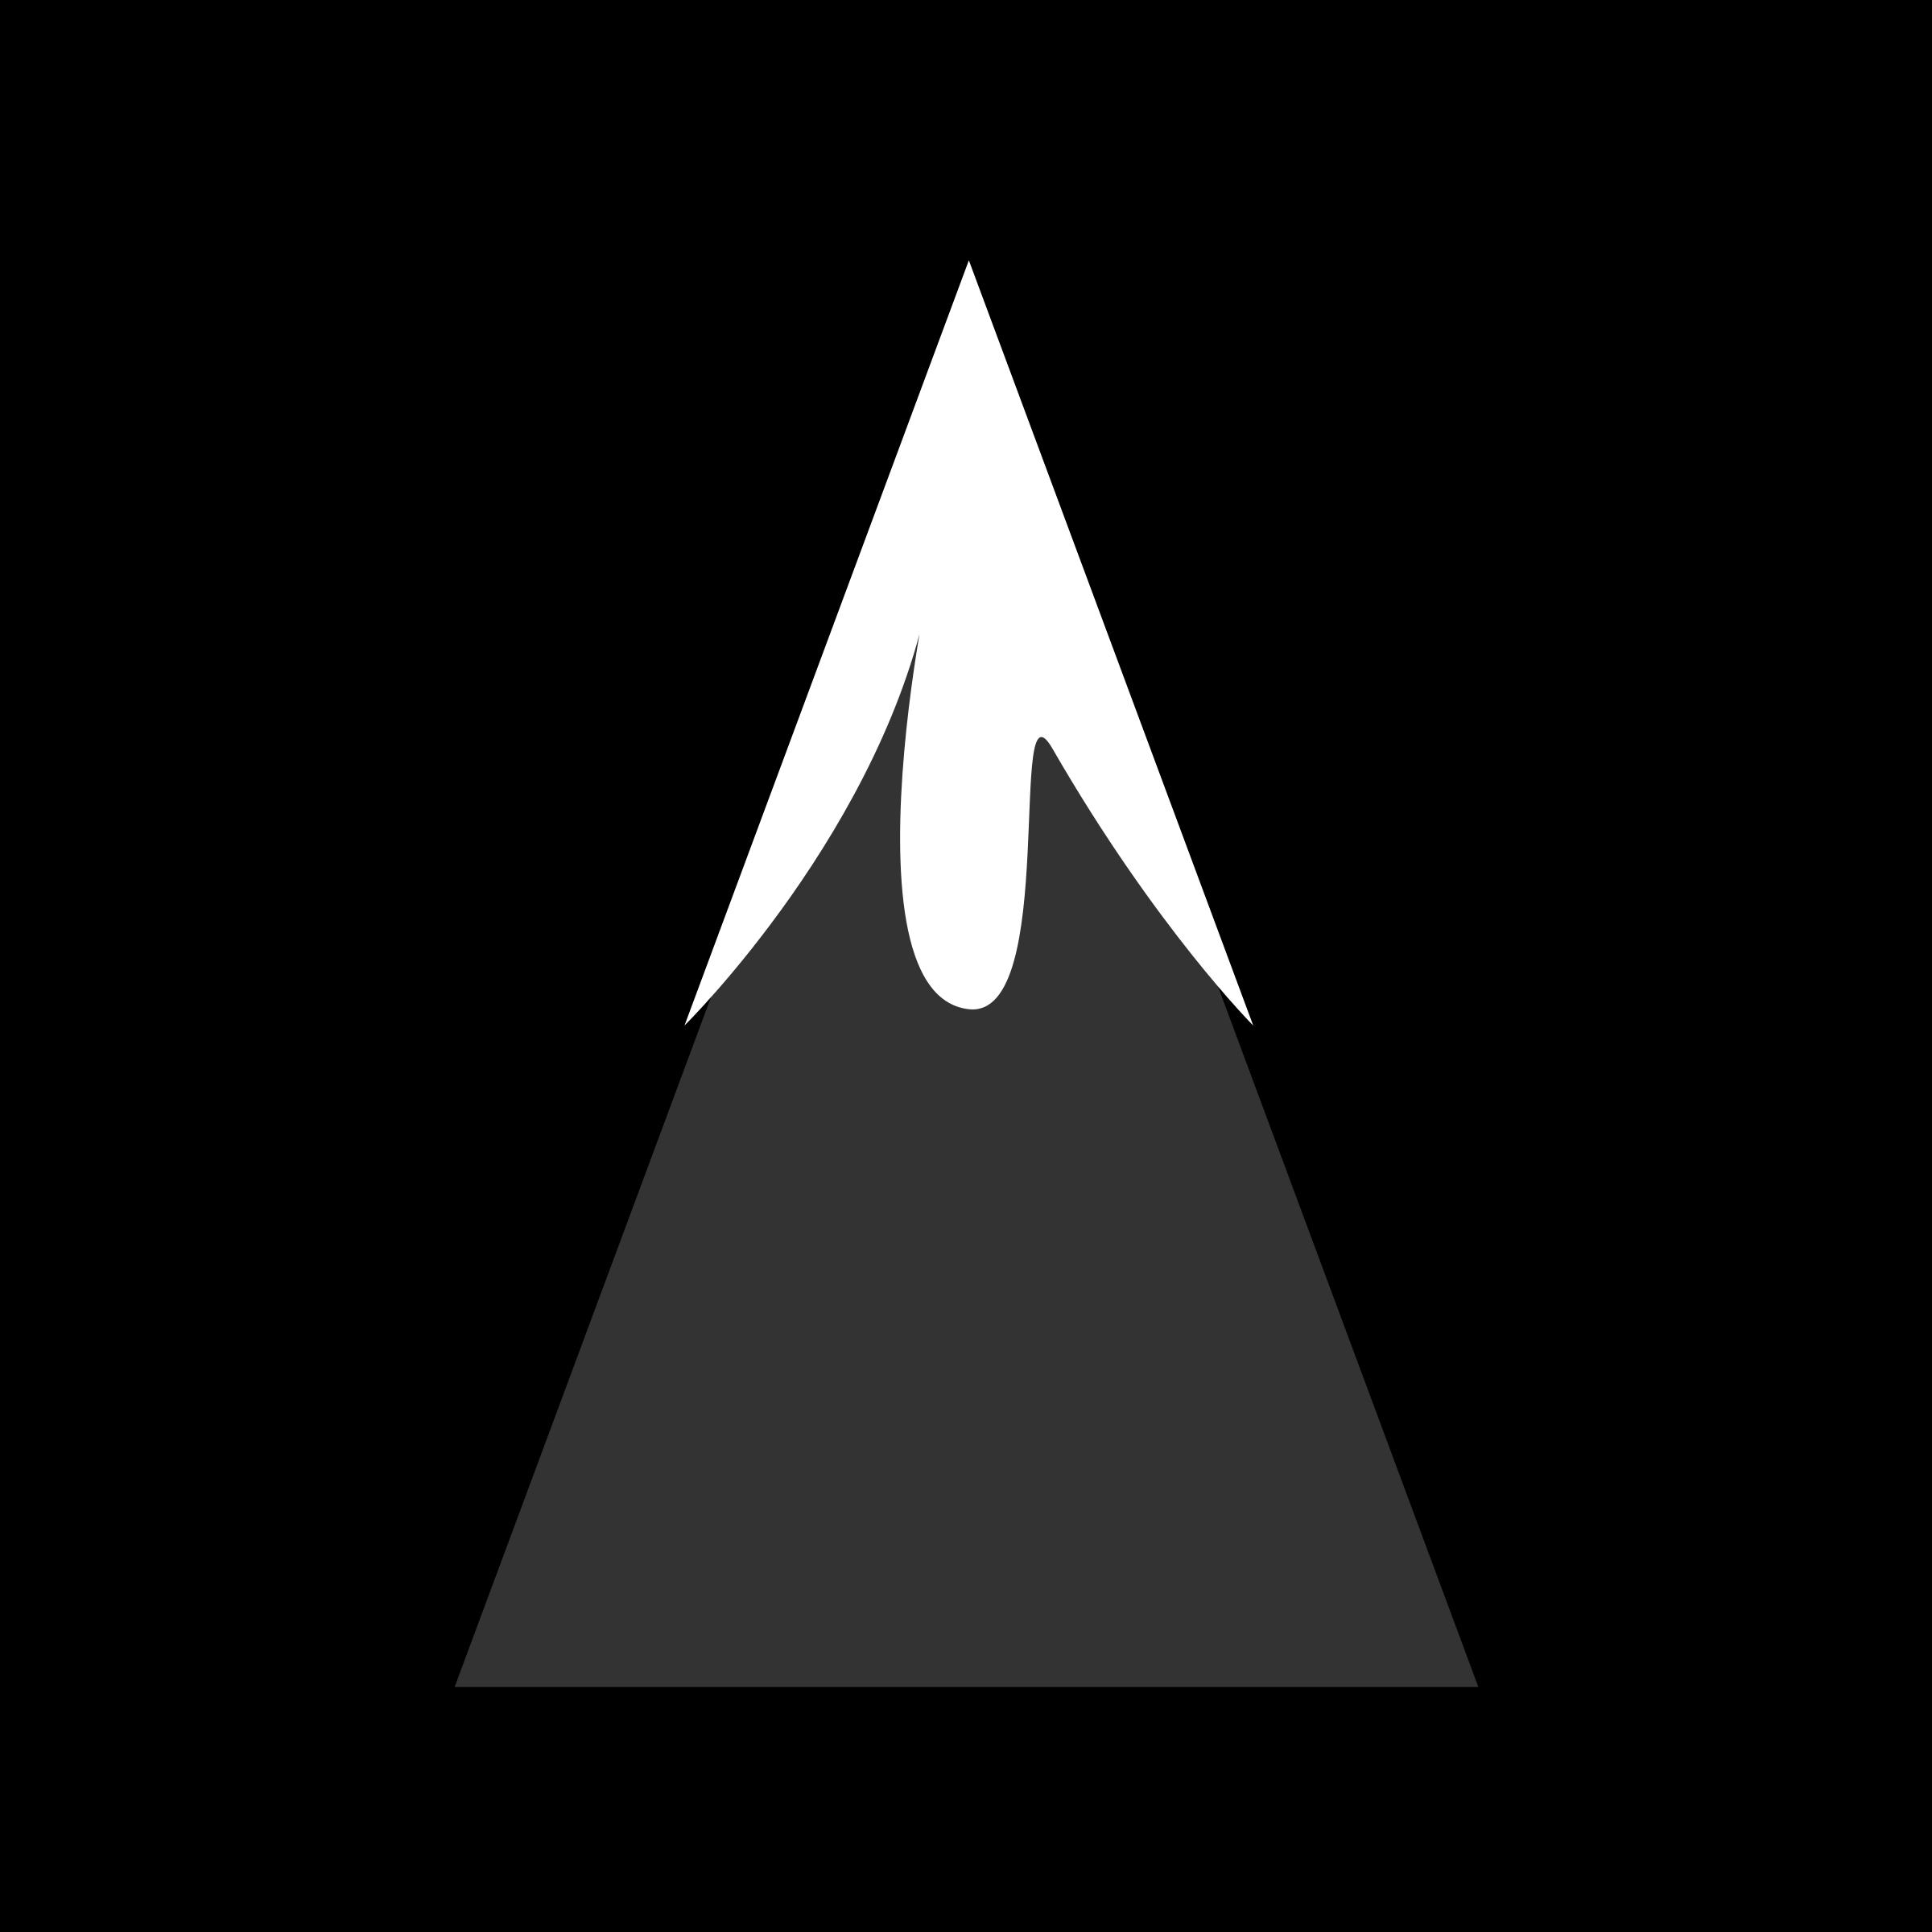 2400x2400 Mountain Clipart